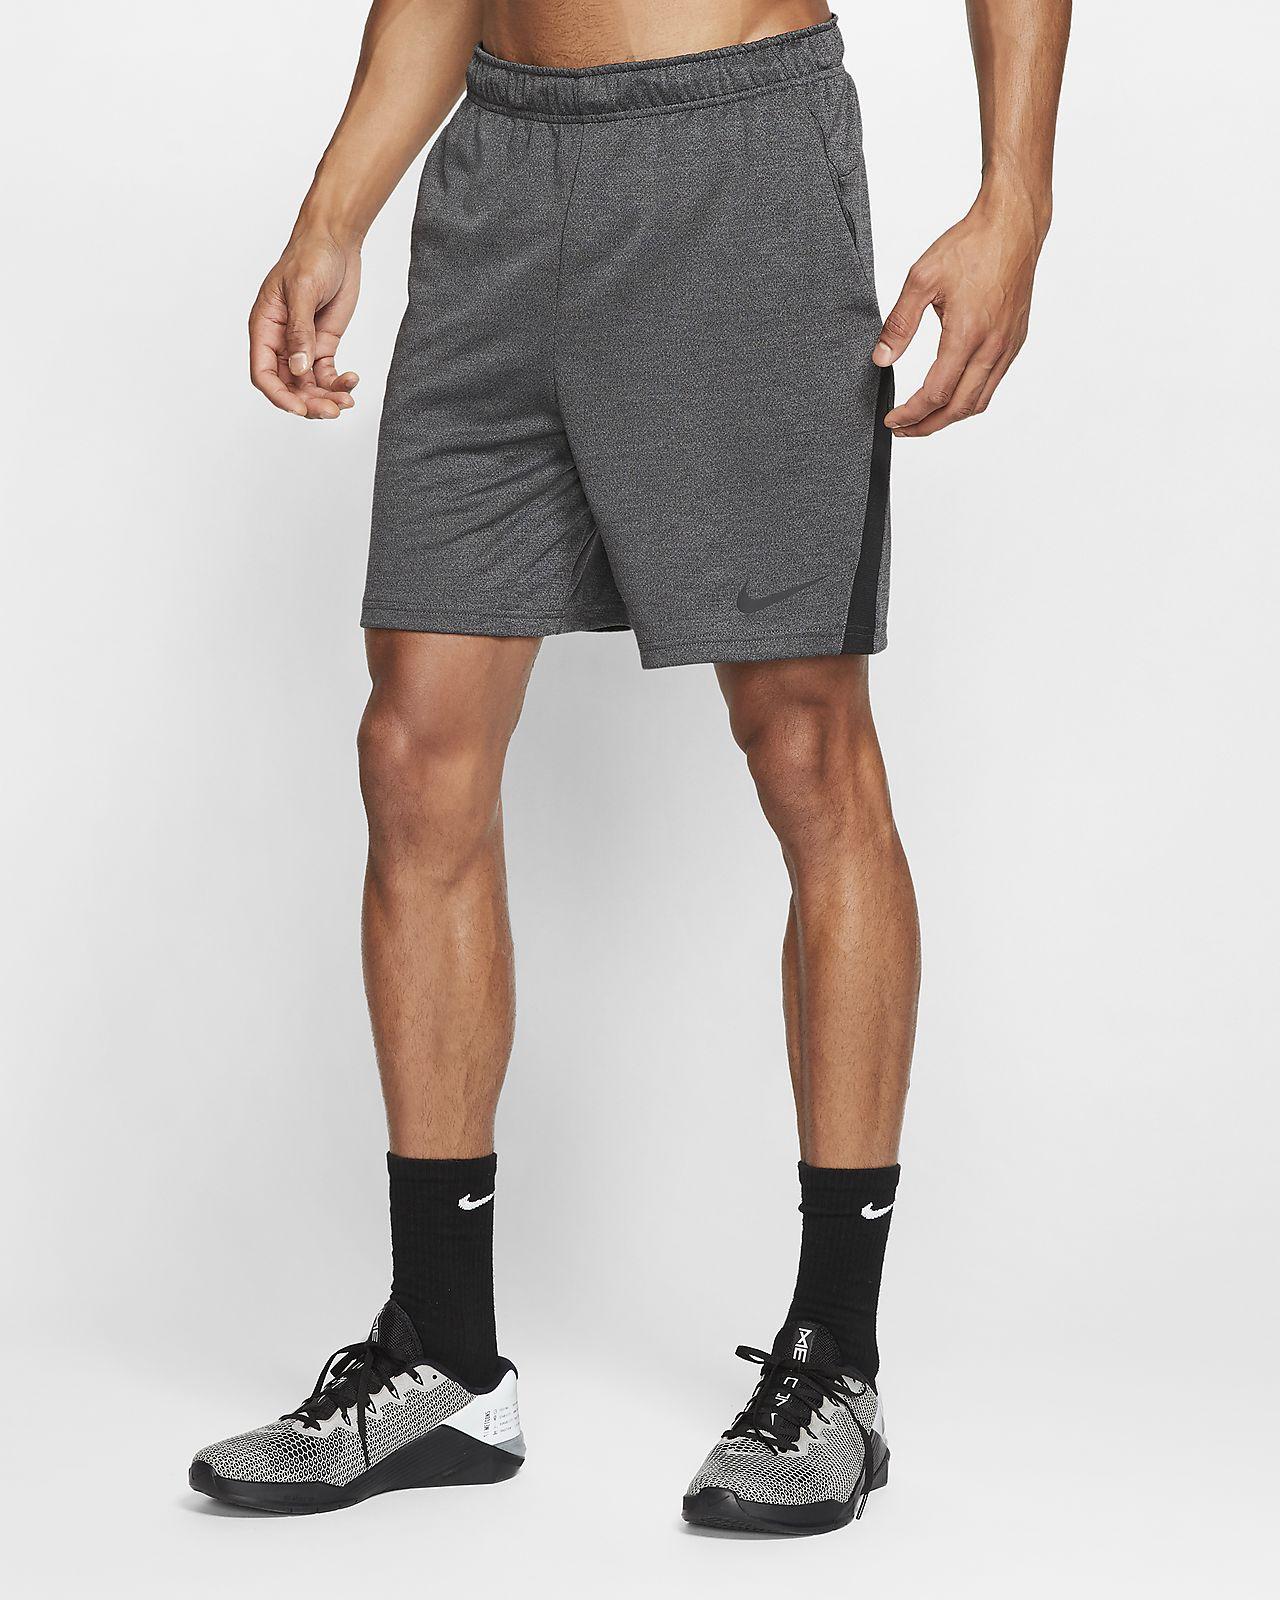 Nike Herren Fitness Trainings Short Nike Dri Fit Pro